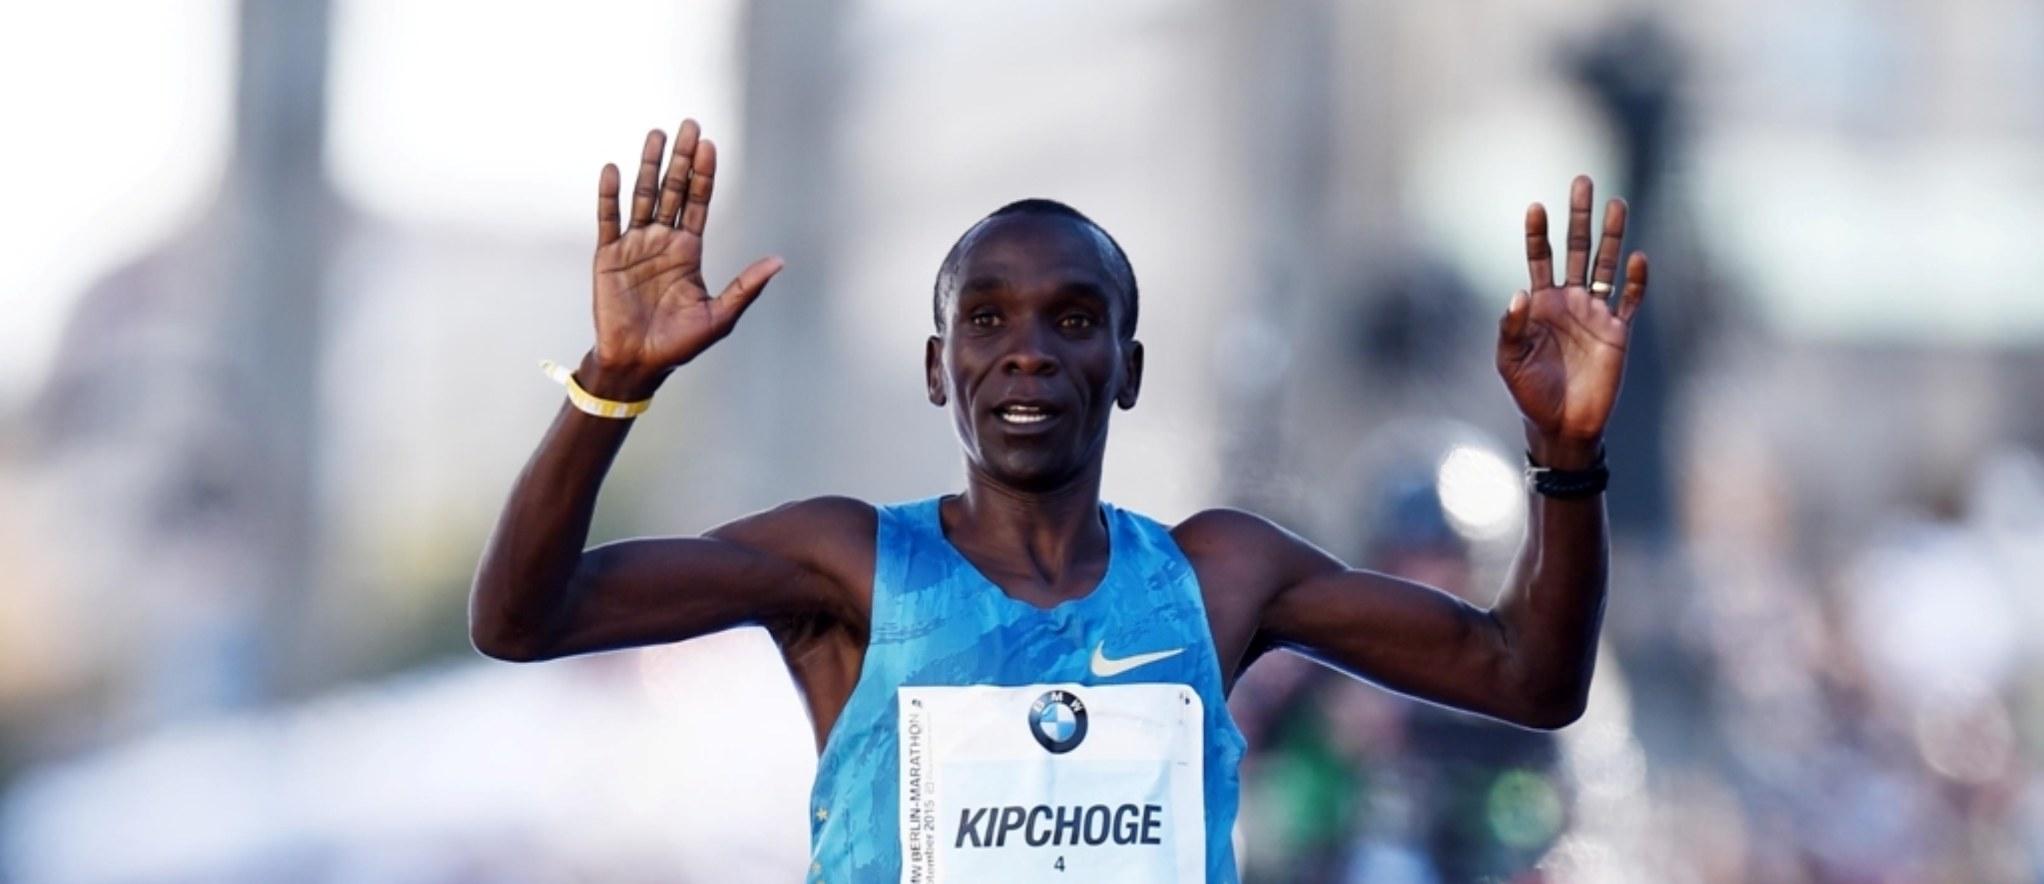 Kipchoge gana la maratón de Berlín, pero sin lograr nuevo récord